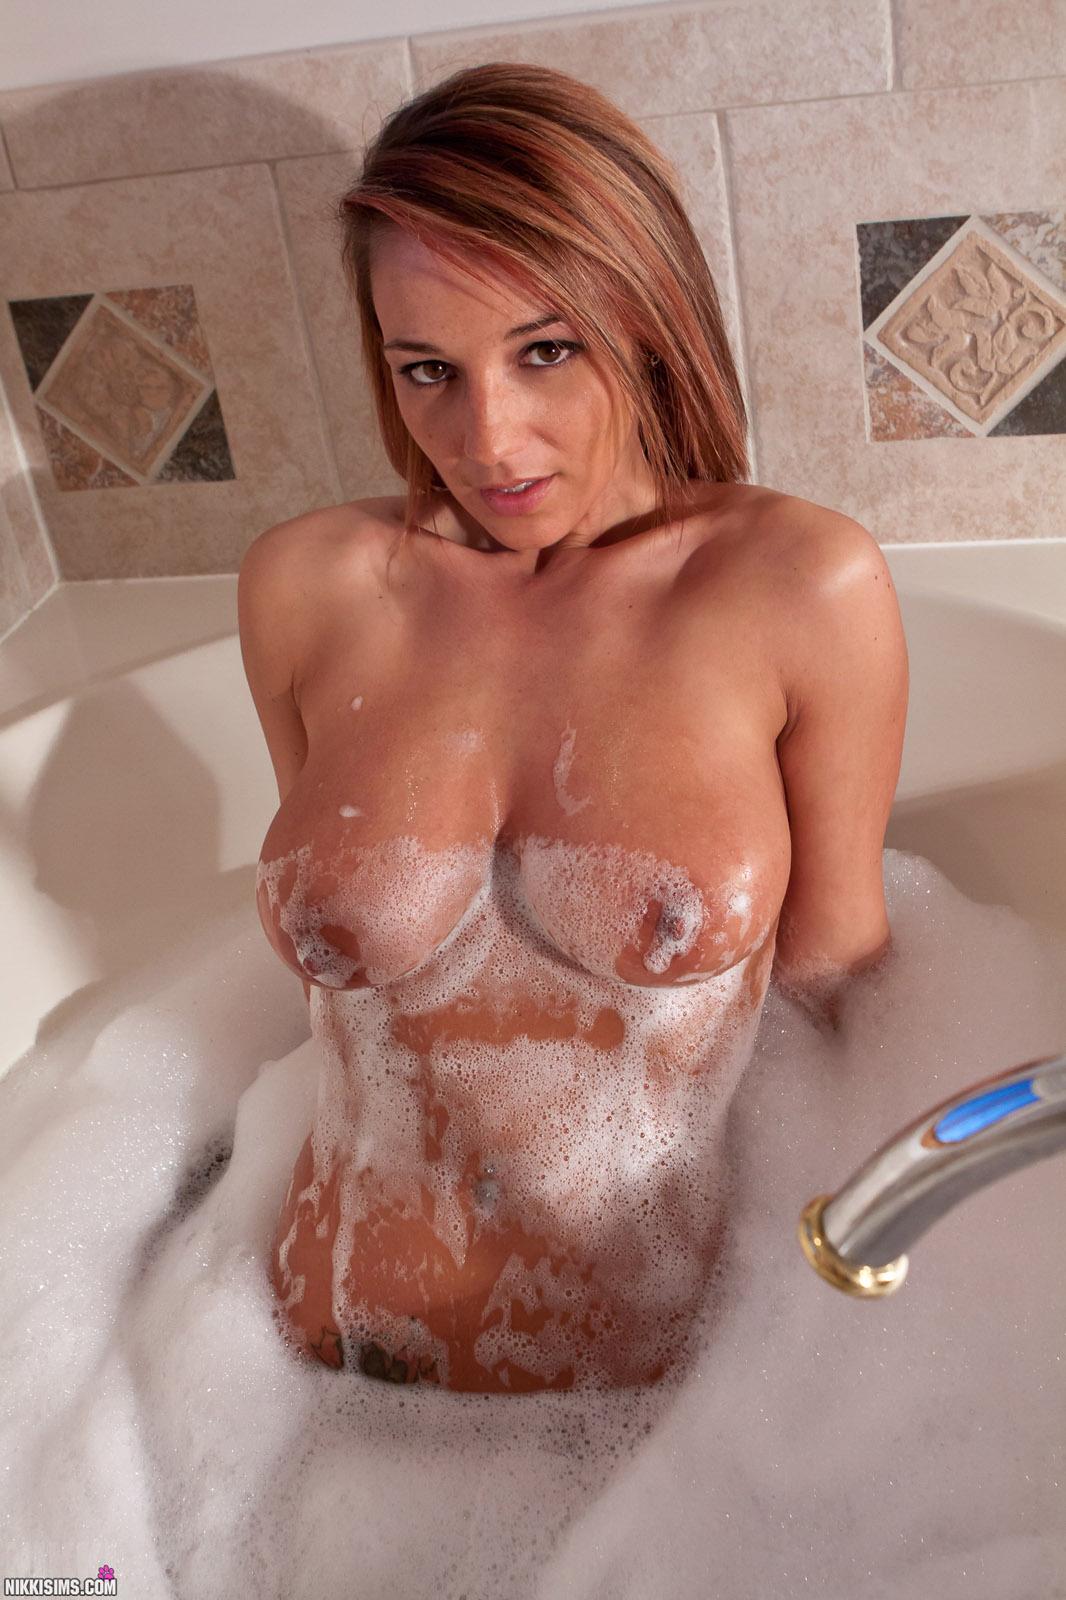 nikki sims bubble bath